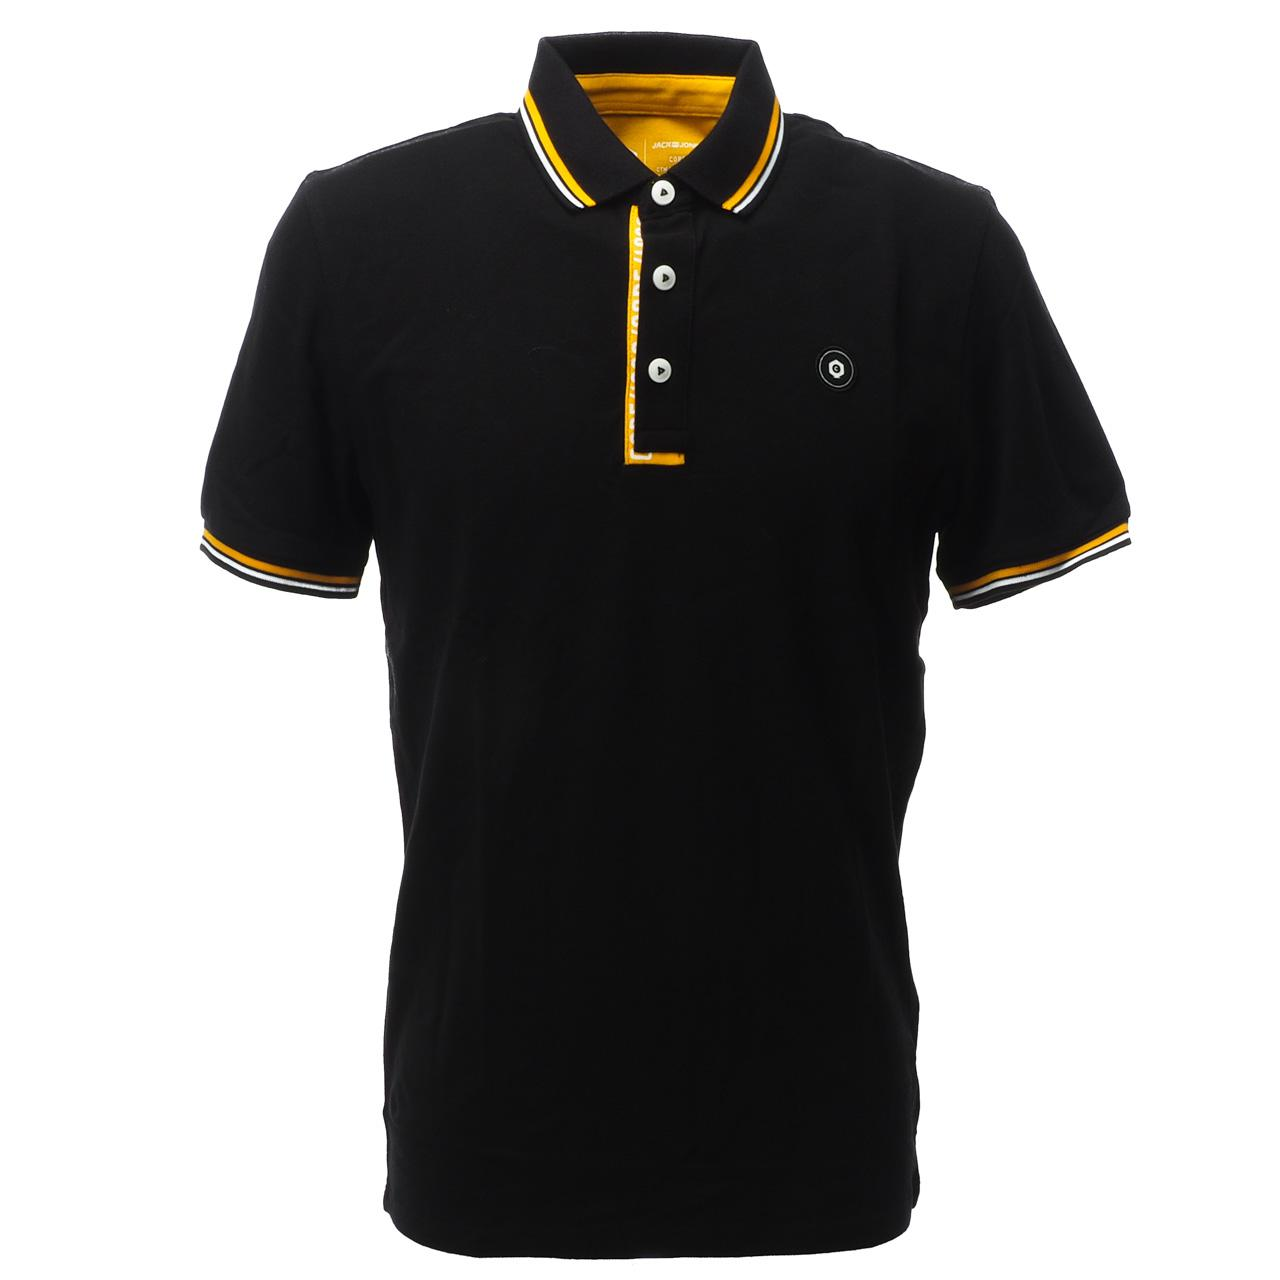 Short-Sleeve-Polo-Jack-and-Jones-Challenge-Black-Mc-Polo-Black-17260-New